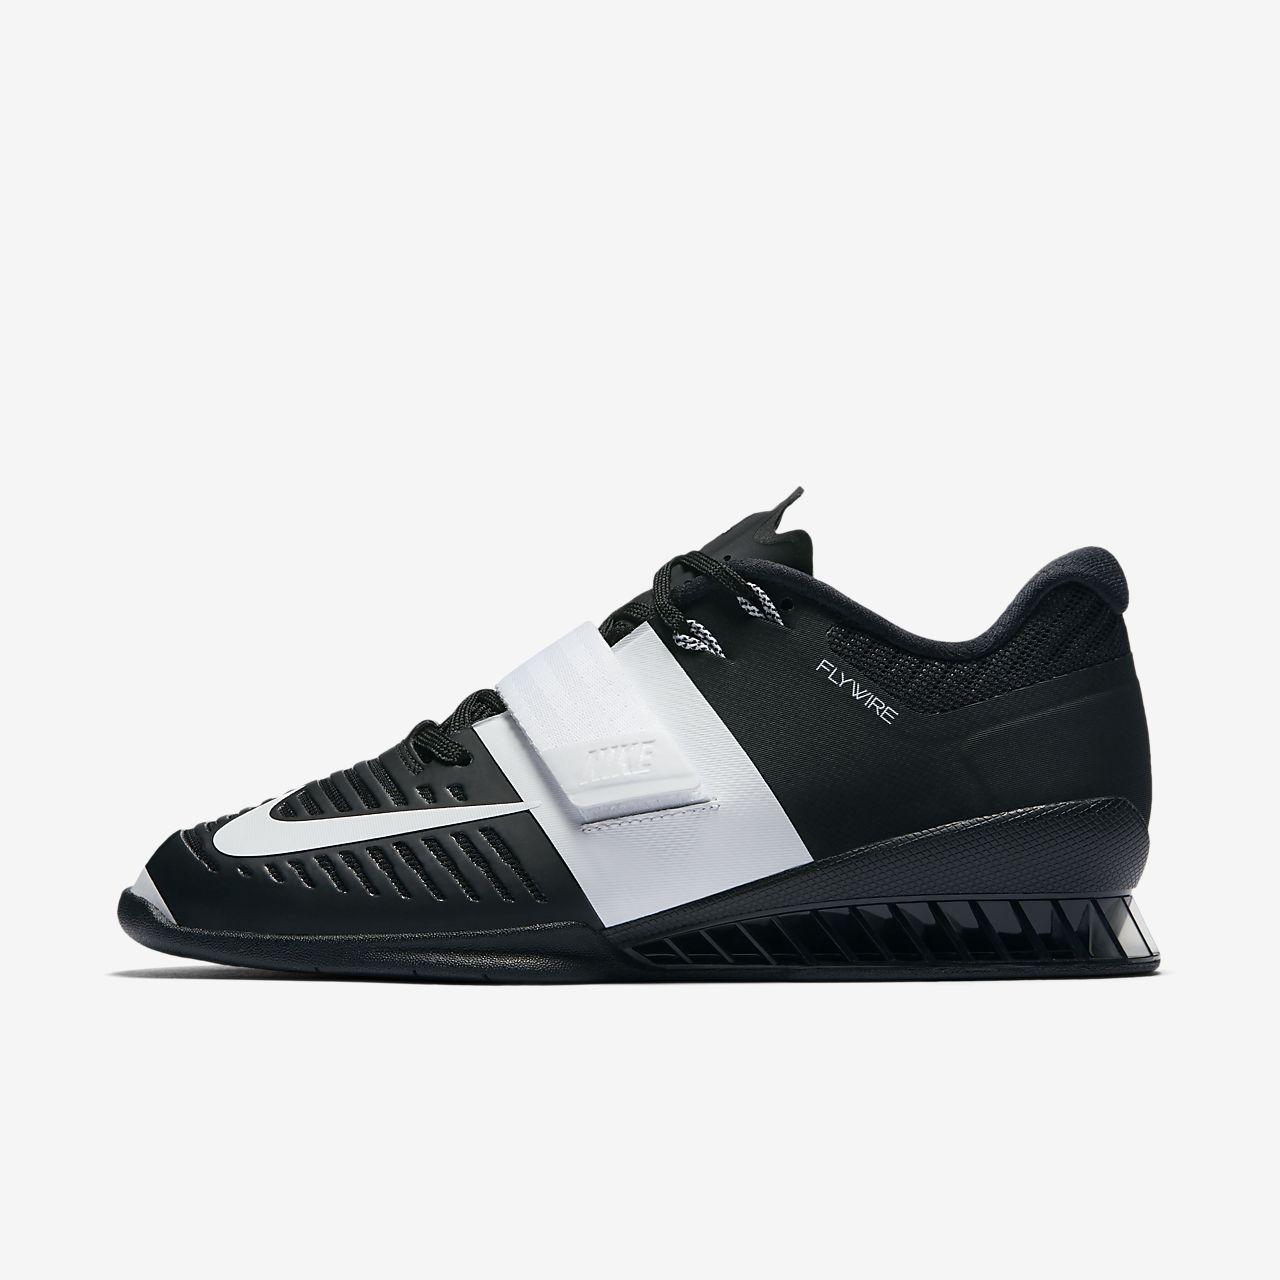 jordan workout shoes nz